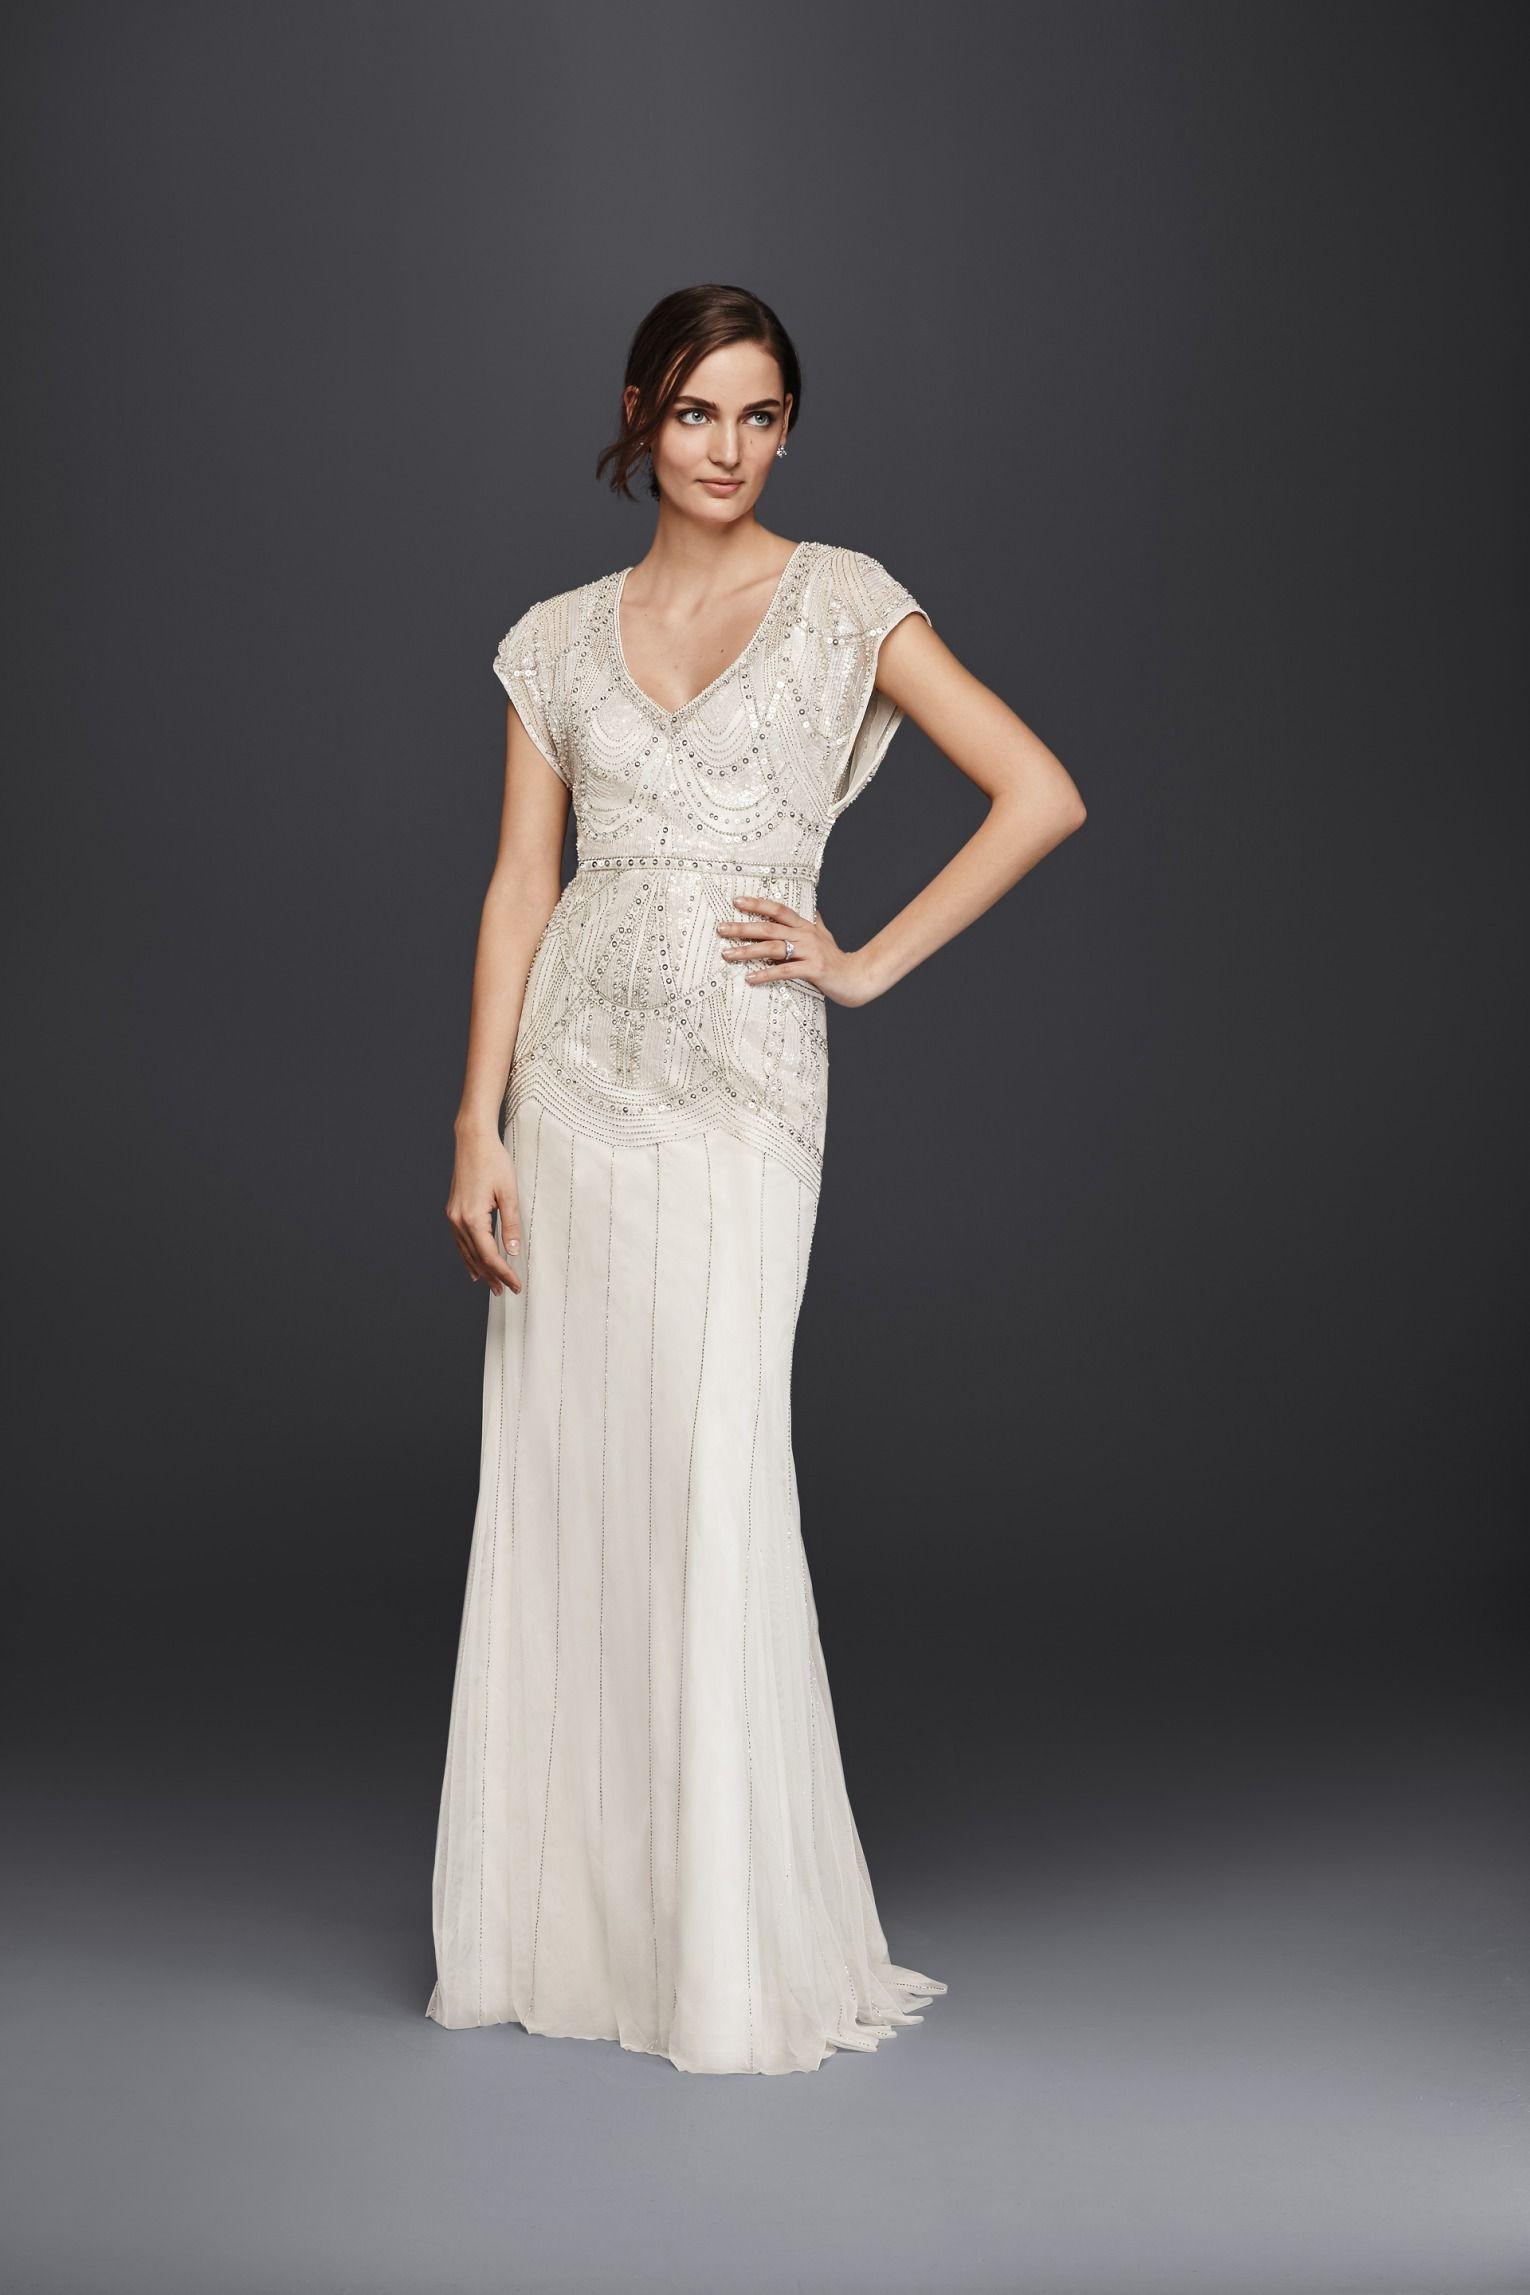 Beaded sheath wedding dress by Wonder by Jenny Packham  b0eff99551fa